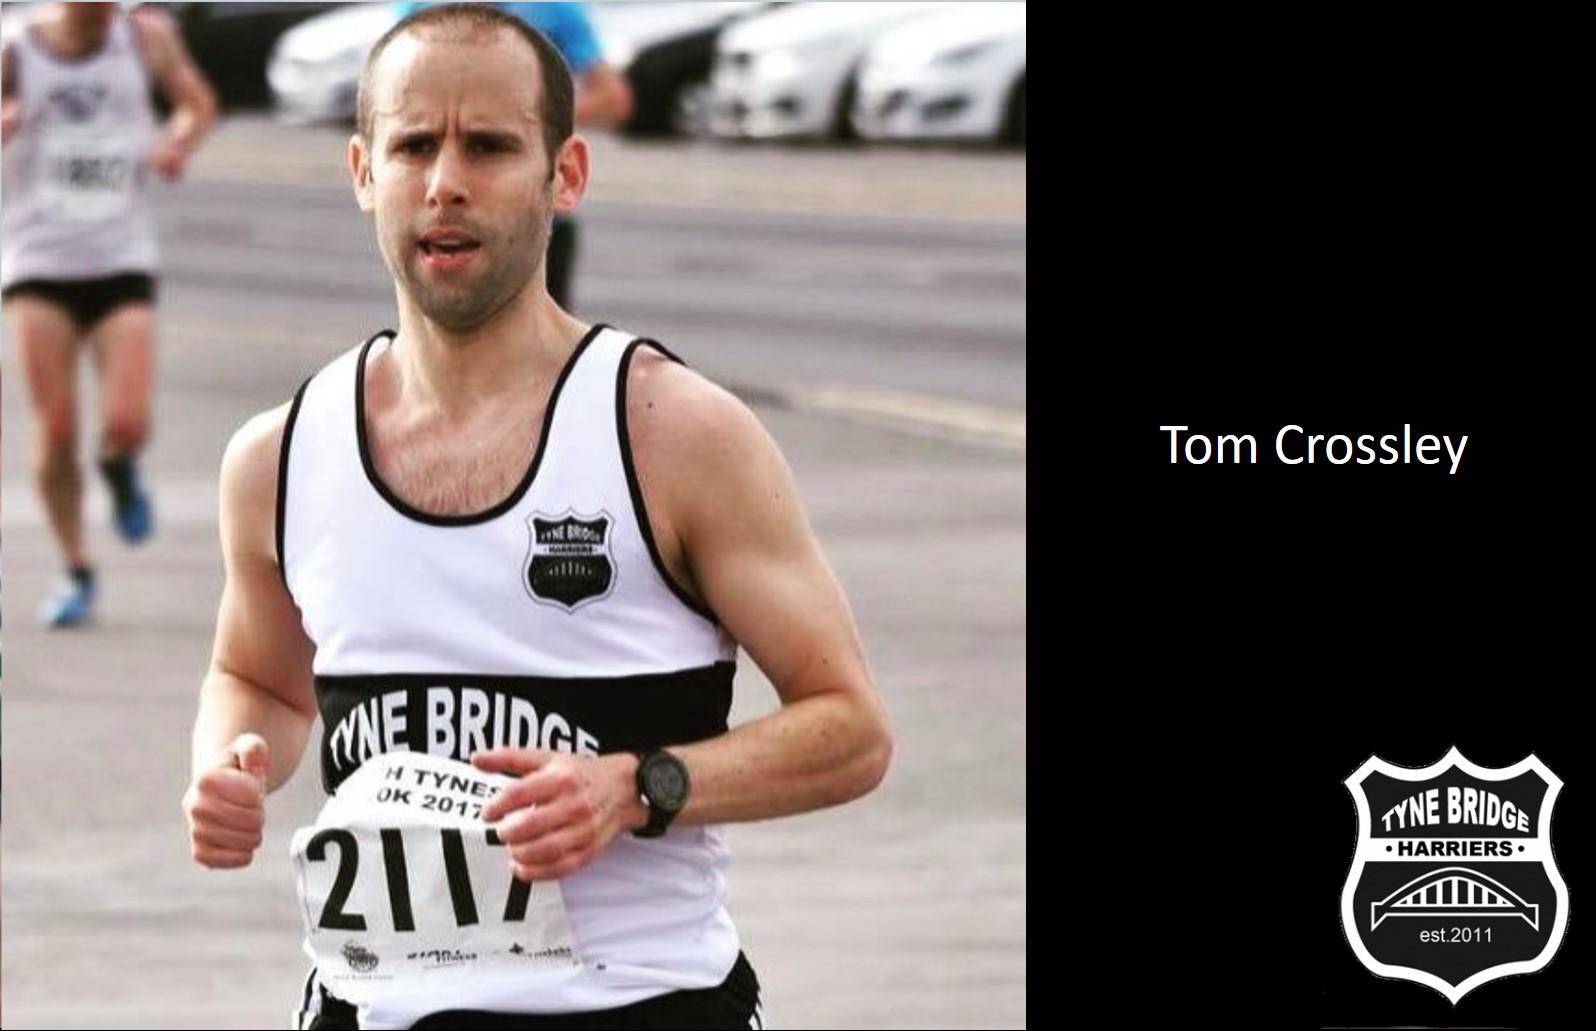 Tom Crossley